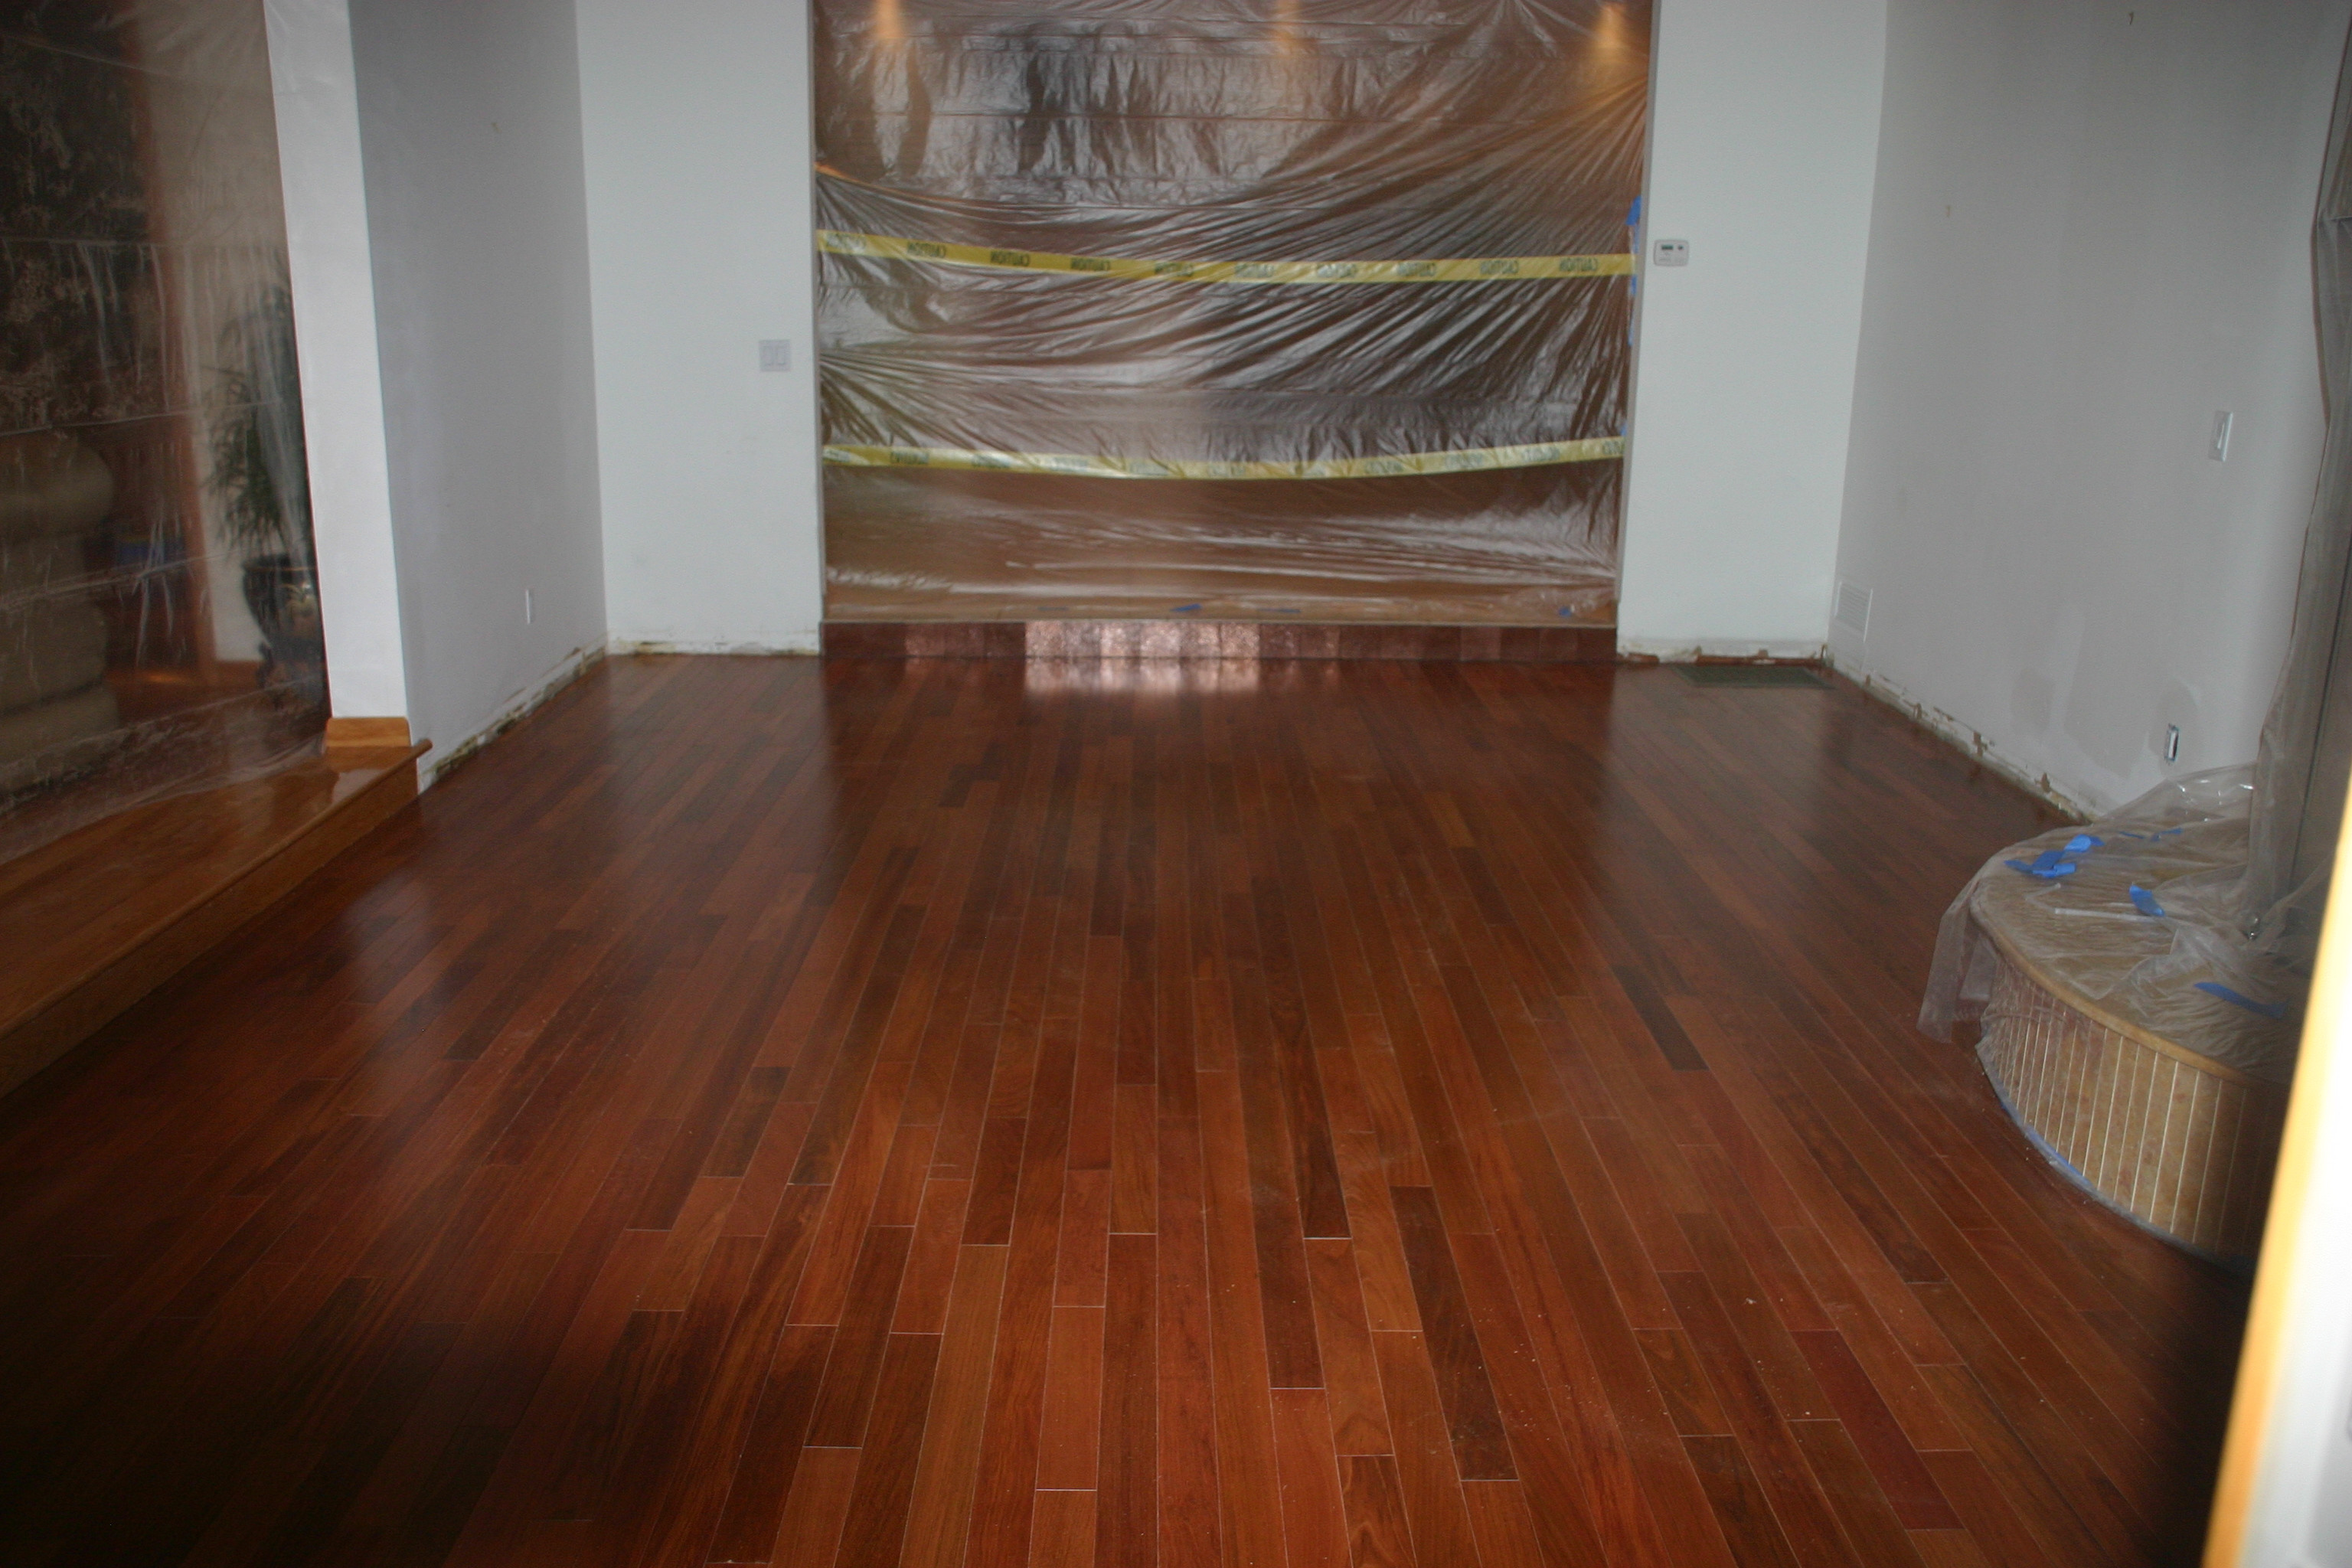 Hardwood Floor Refinishing Morris County Nj Of Hardwood Flooring Watchung New Jersey Inside Webassets Huggins274 Jpg